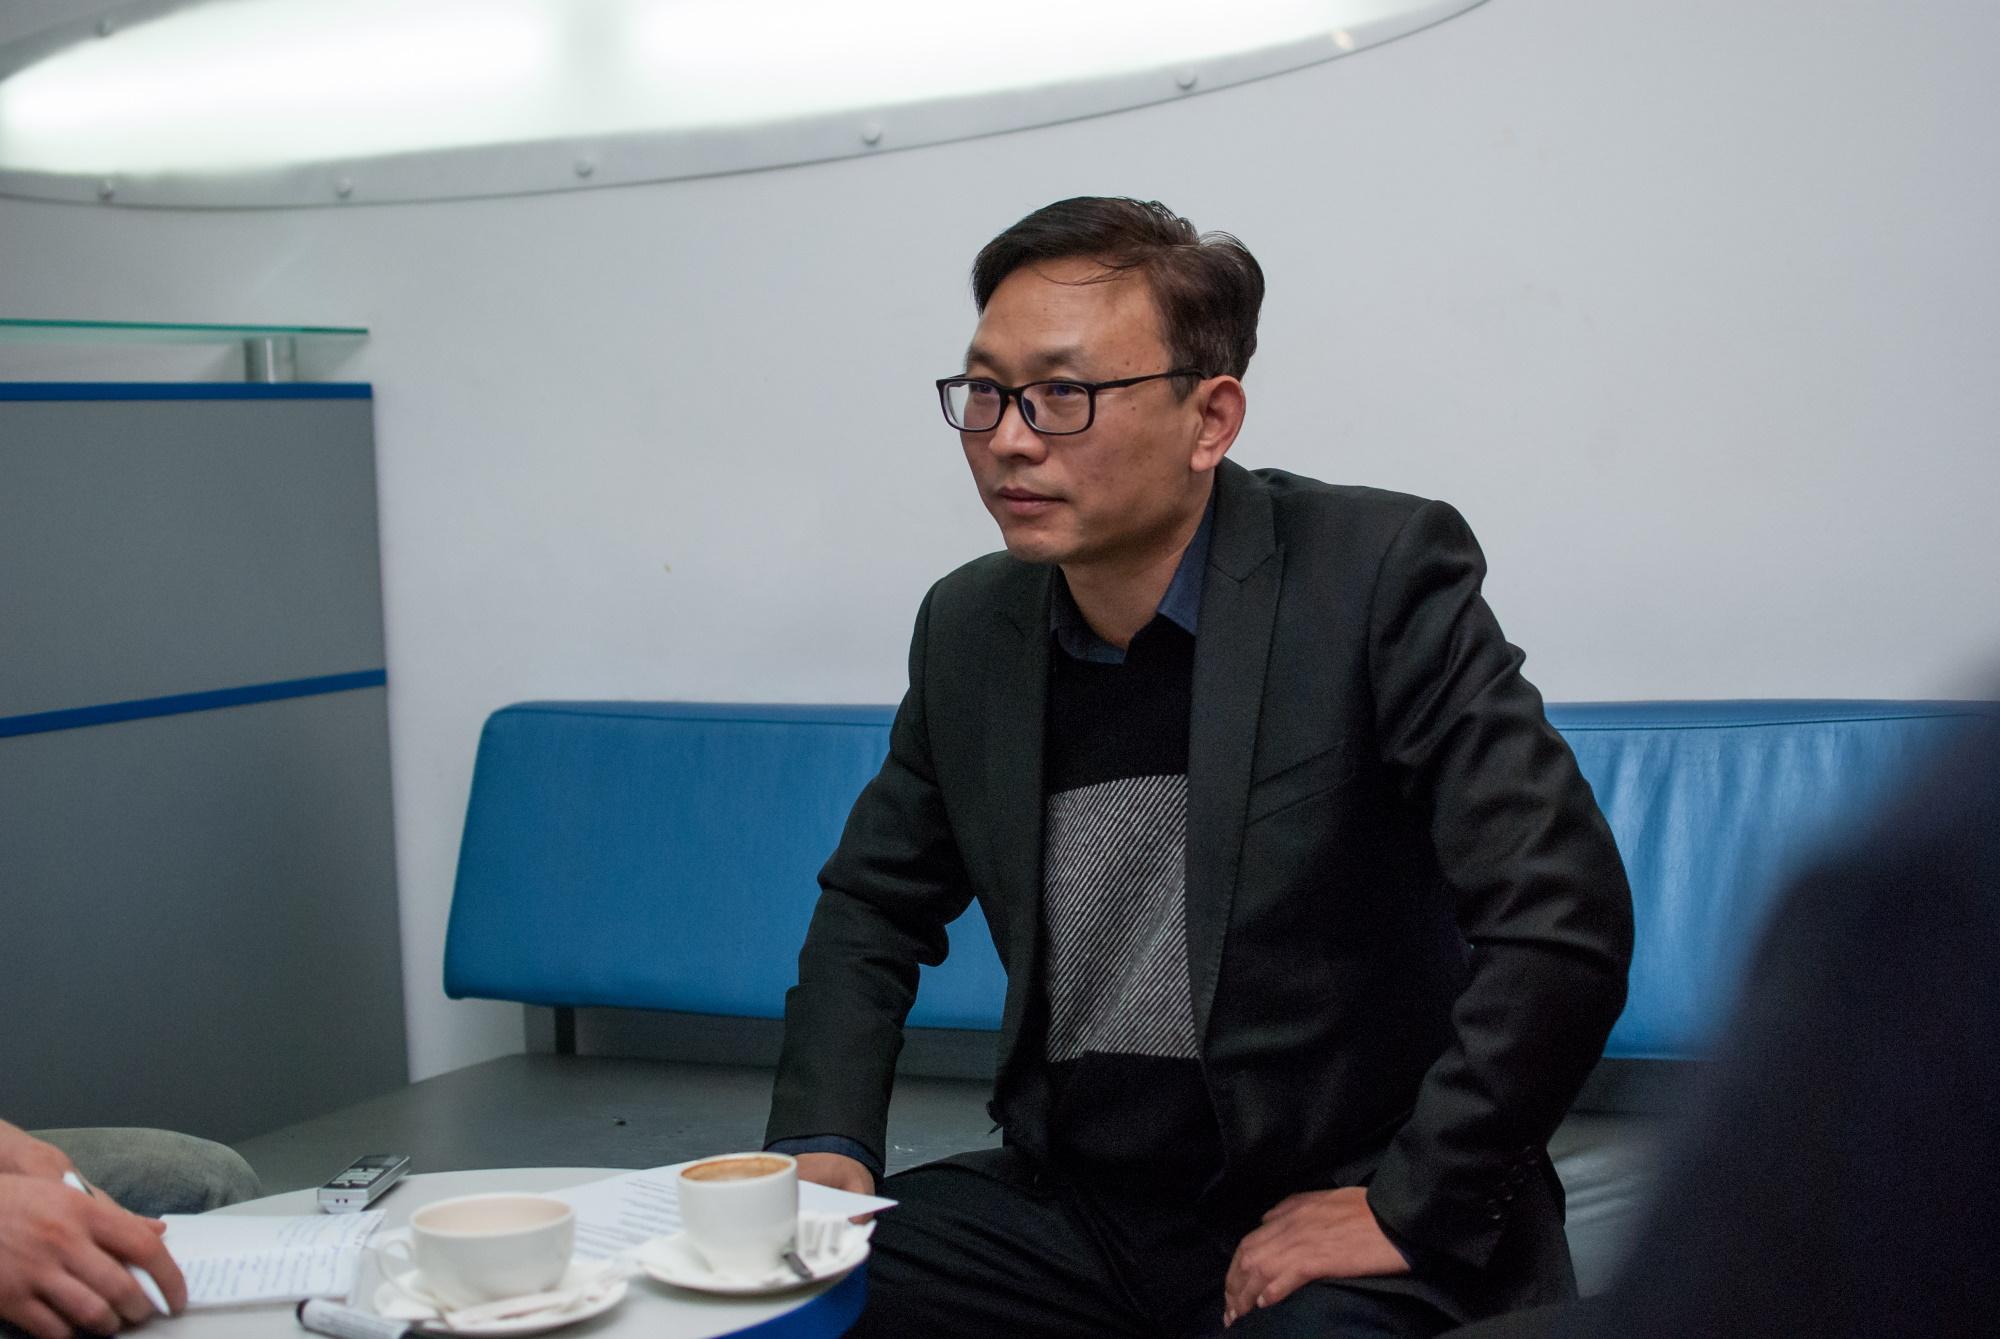 Цуй Юньлян (Cui Yunliang), C-DATA